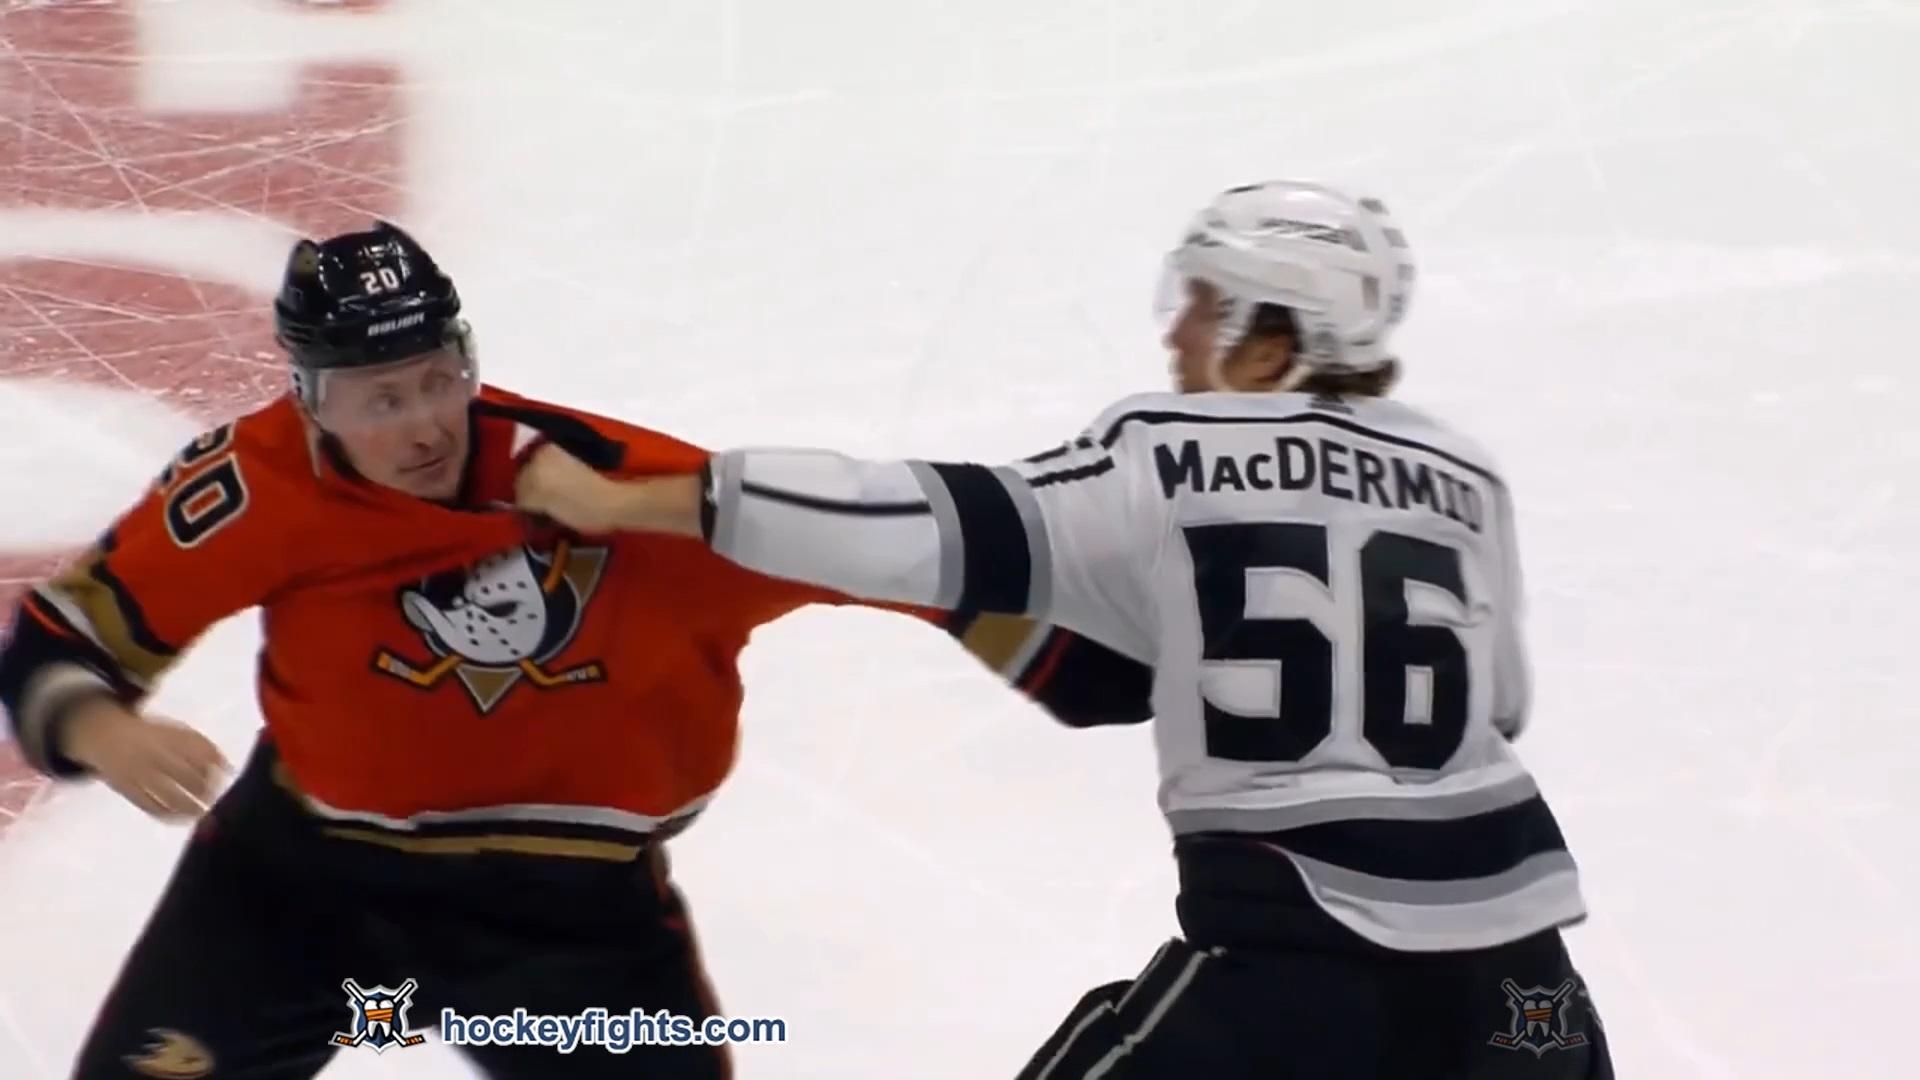 Nicolas Deslauriers vs. Kurtis MacDermid